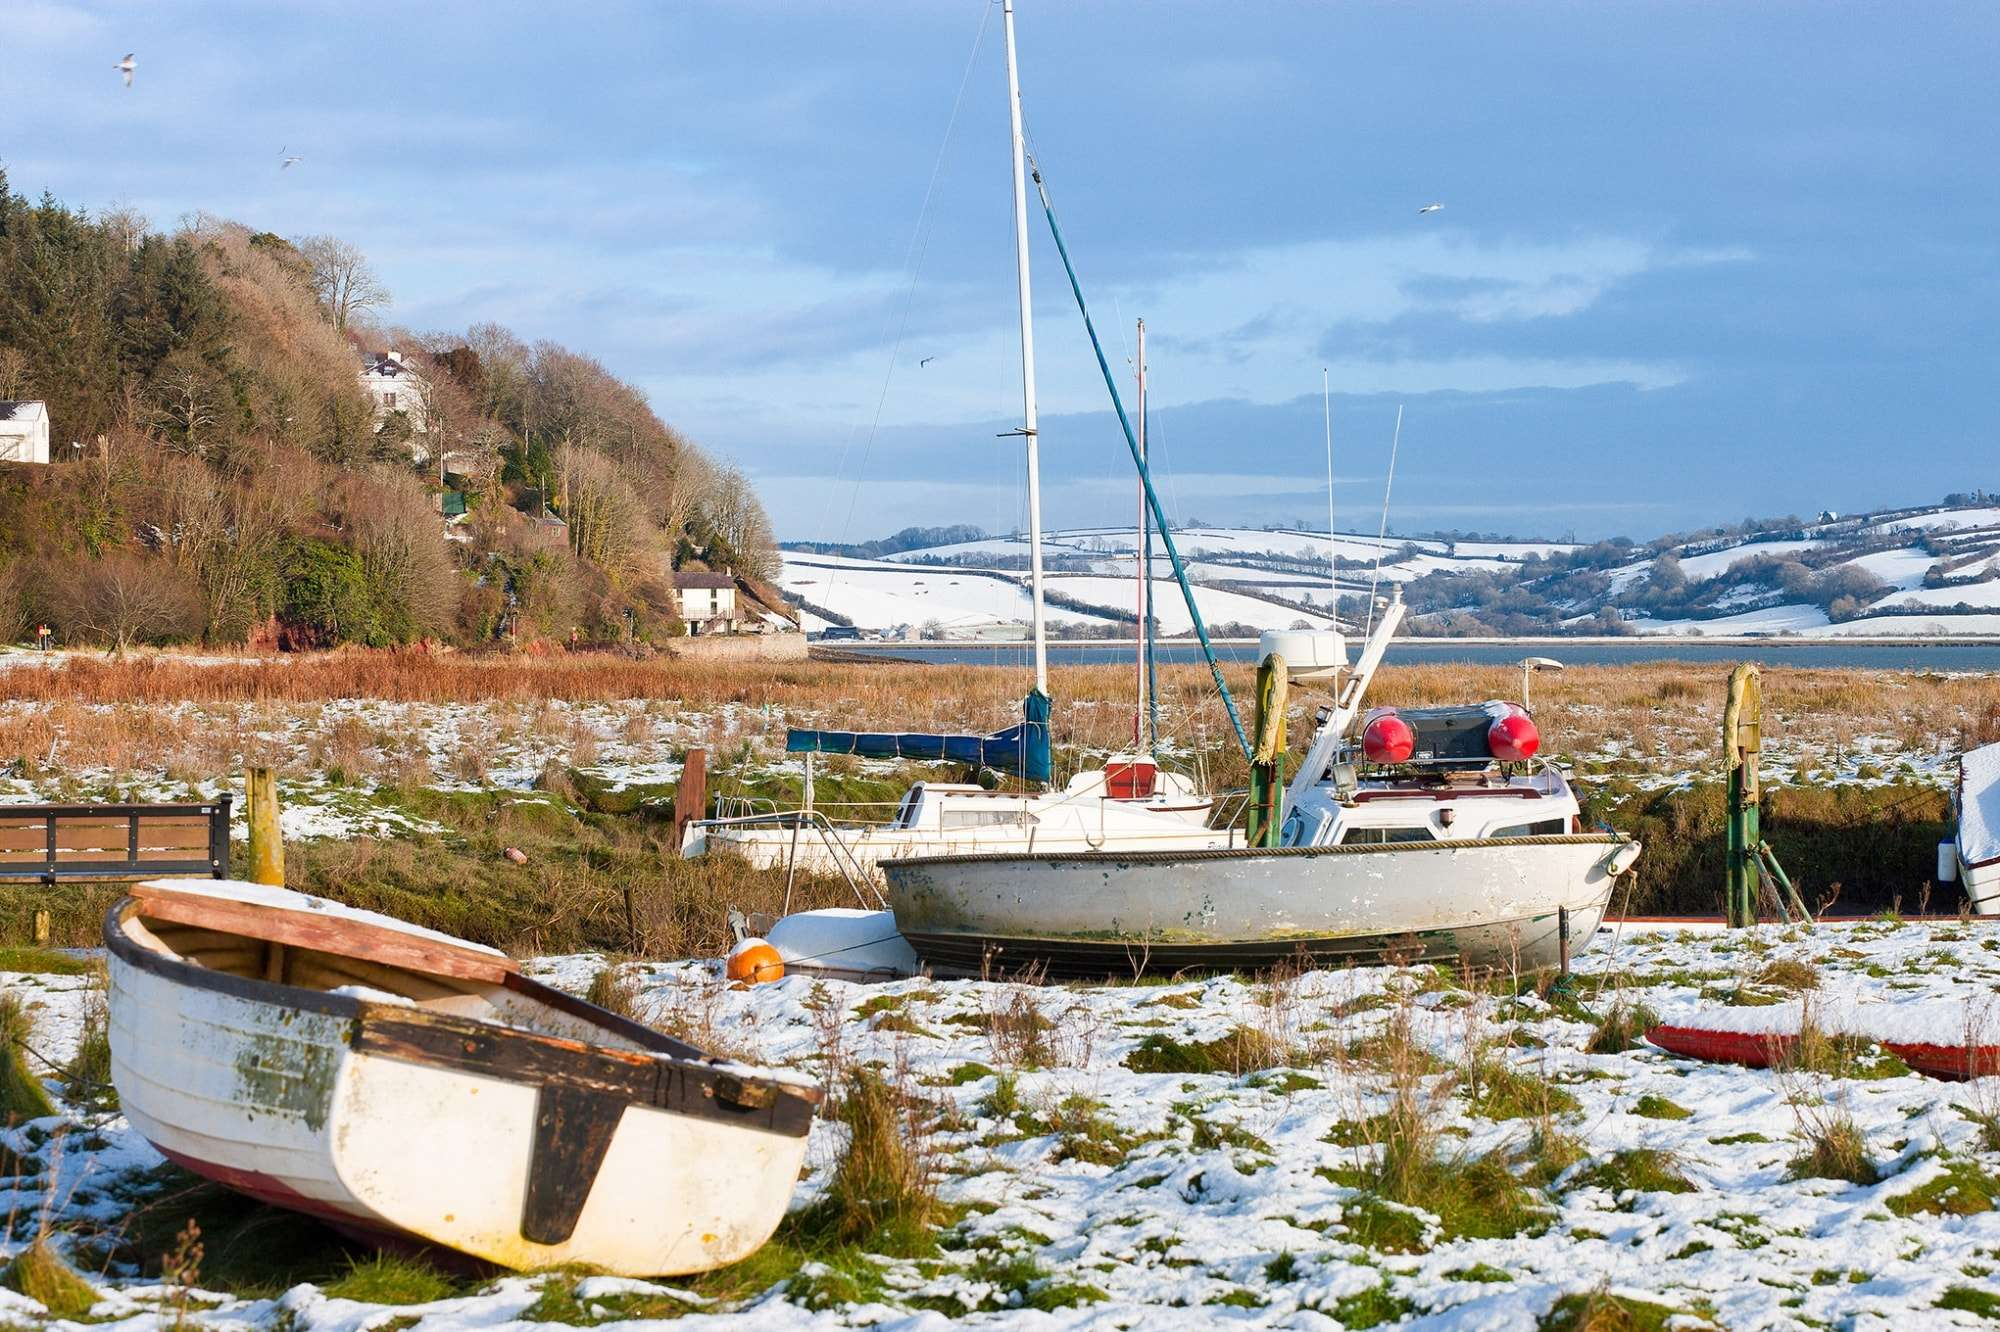 Image of Dylan Thomas Boathouse and Taf Estuary Carmarthenshire, Wales